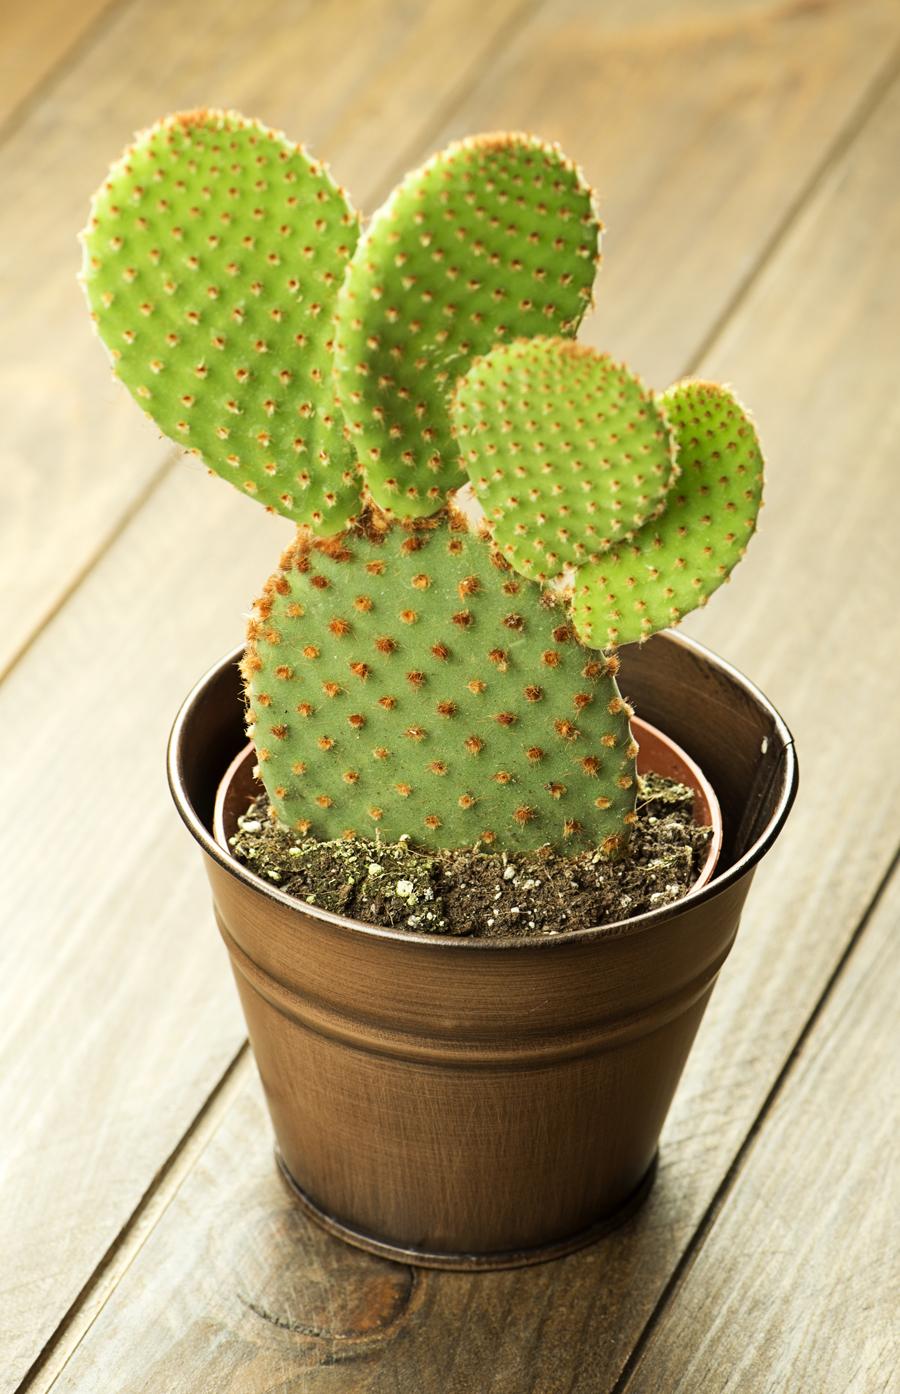 Bellissima pianta grassa in vaso.